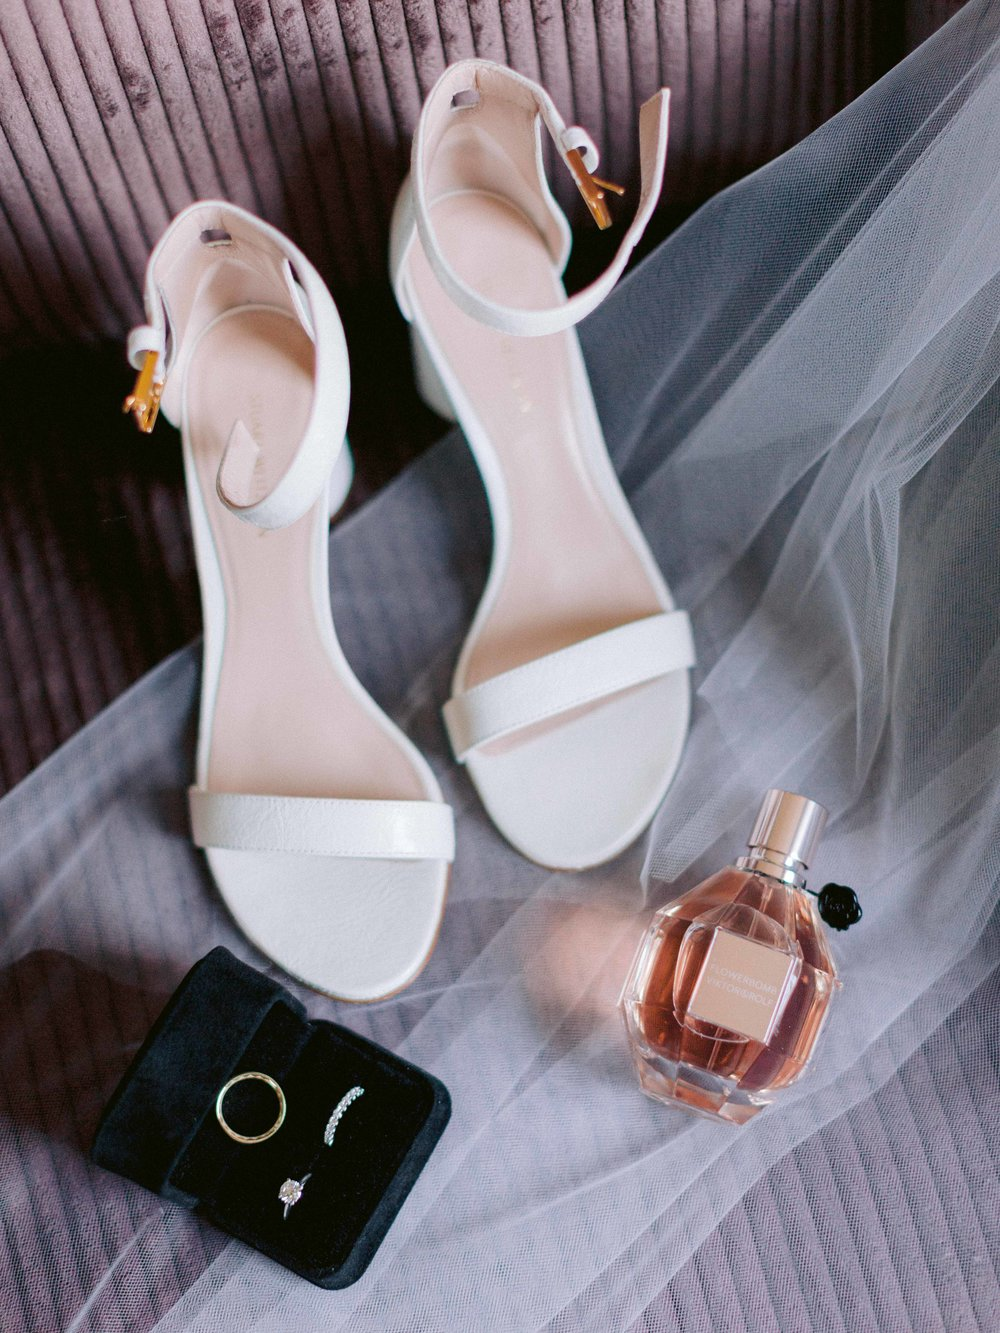 Niagara_on_the_lake_spring_wedding_kurtz_orpia_toronto_Vineyard_wedding_fine_art (6 of 92).jpg